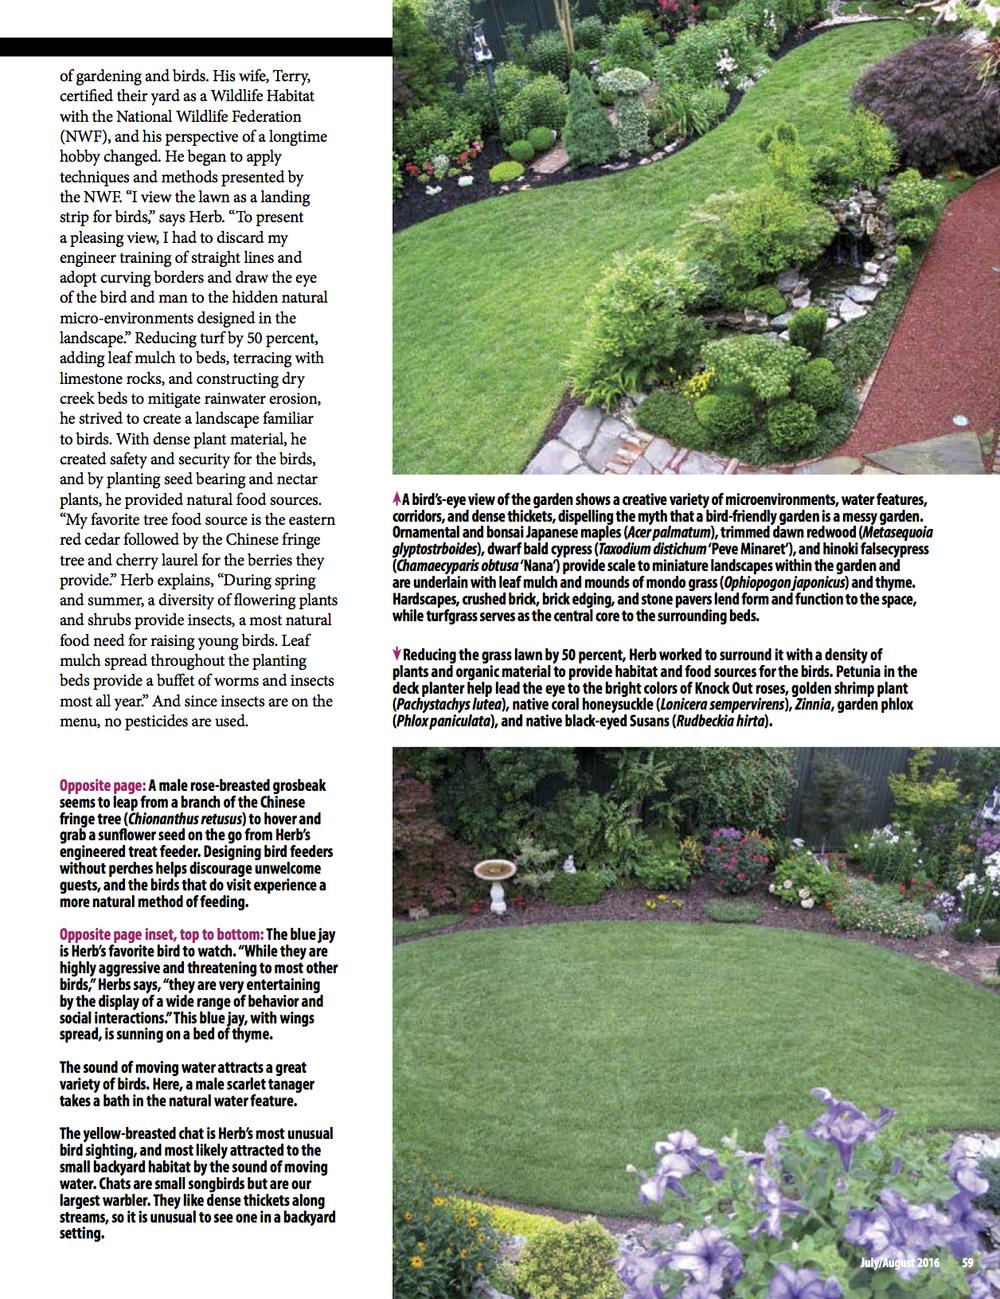 ALG_JulAug16_GardenProfile_Reynolds2.jpg